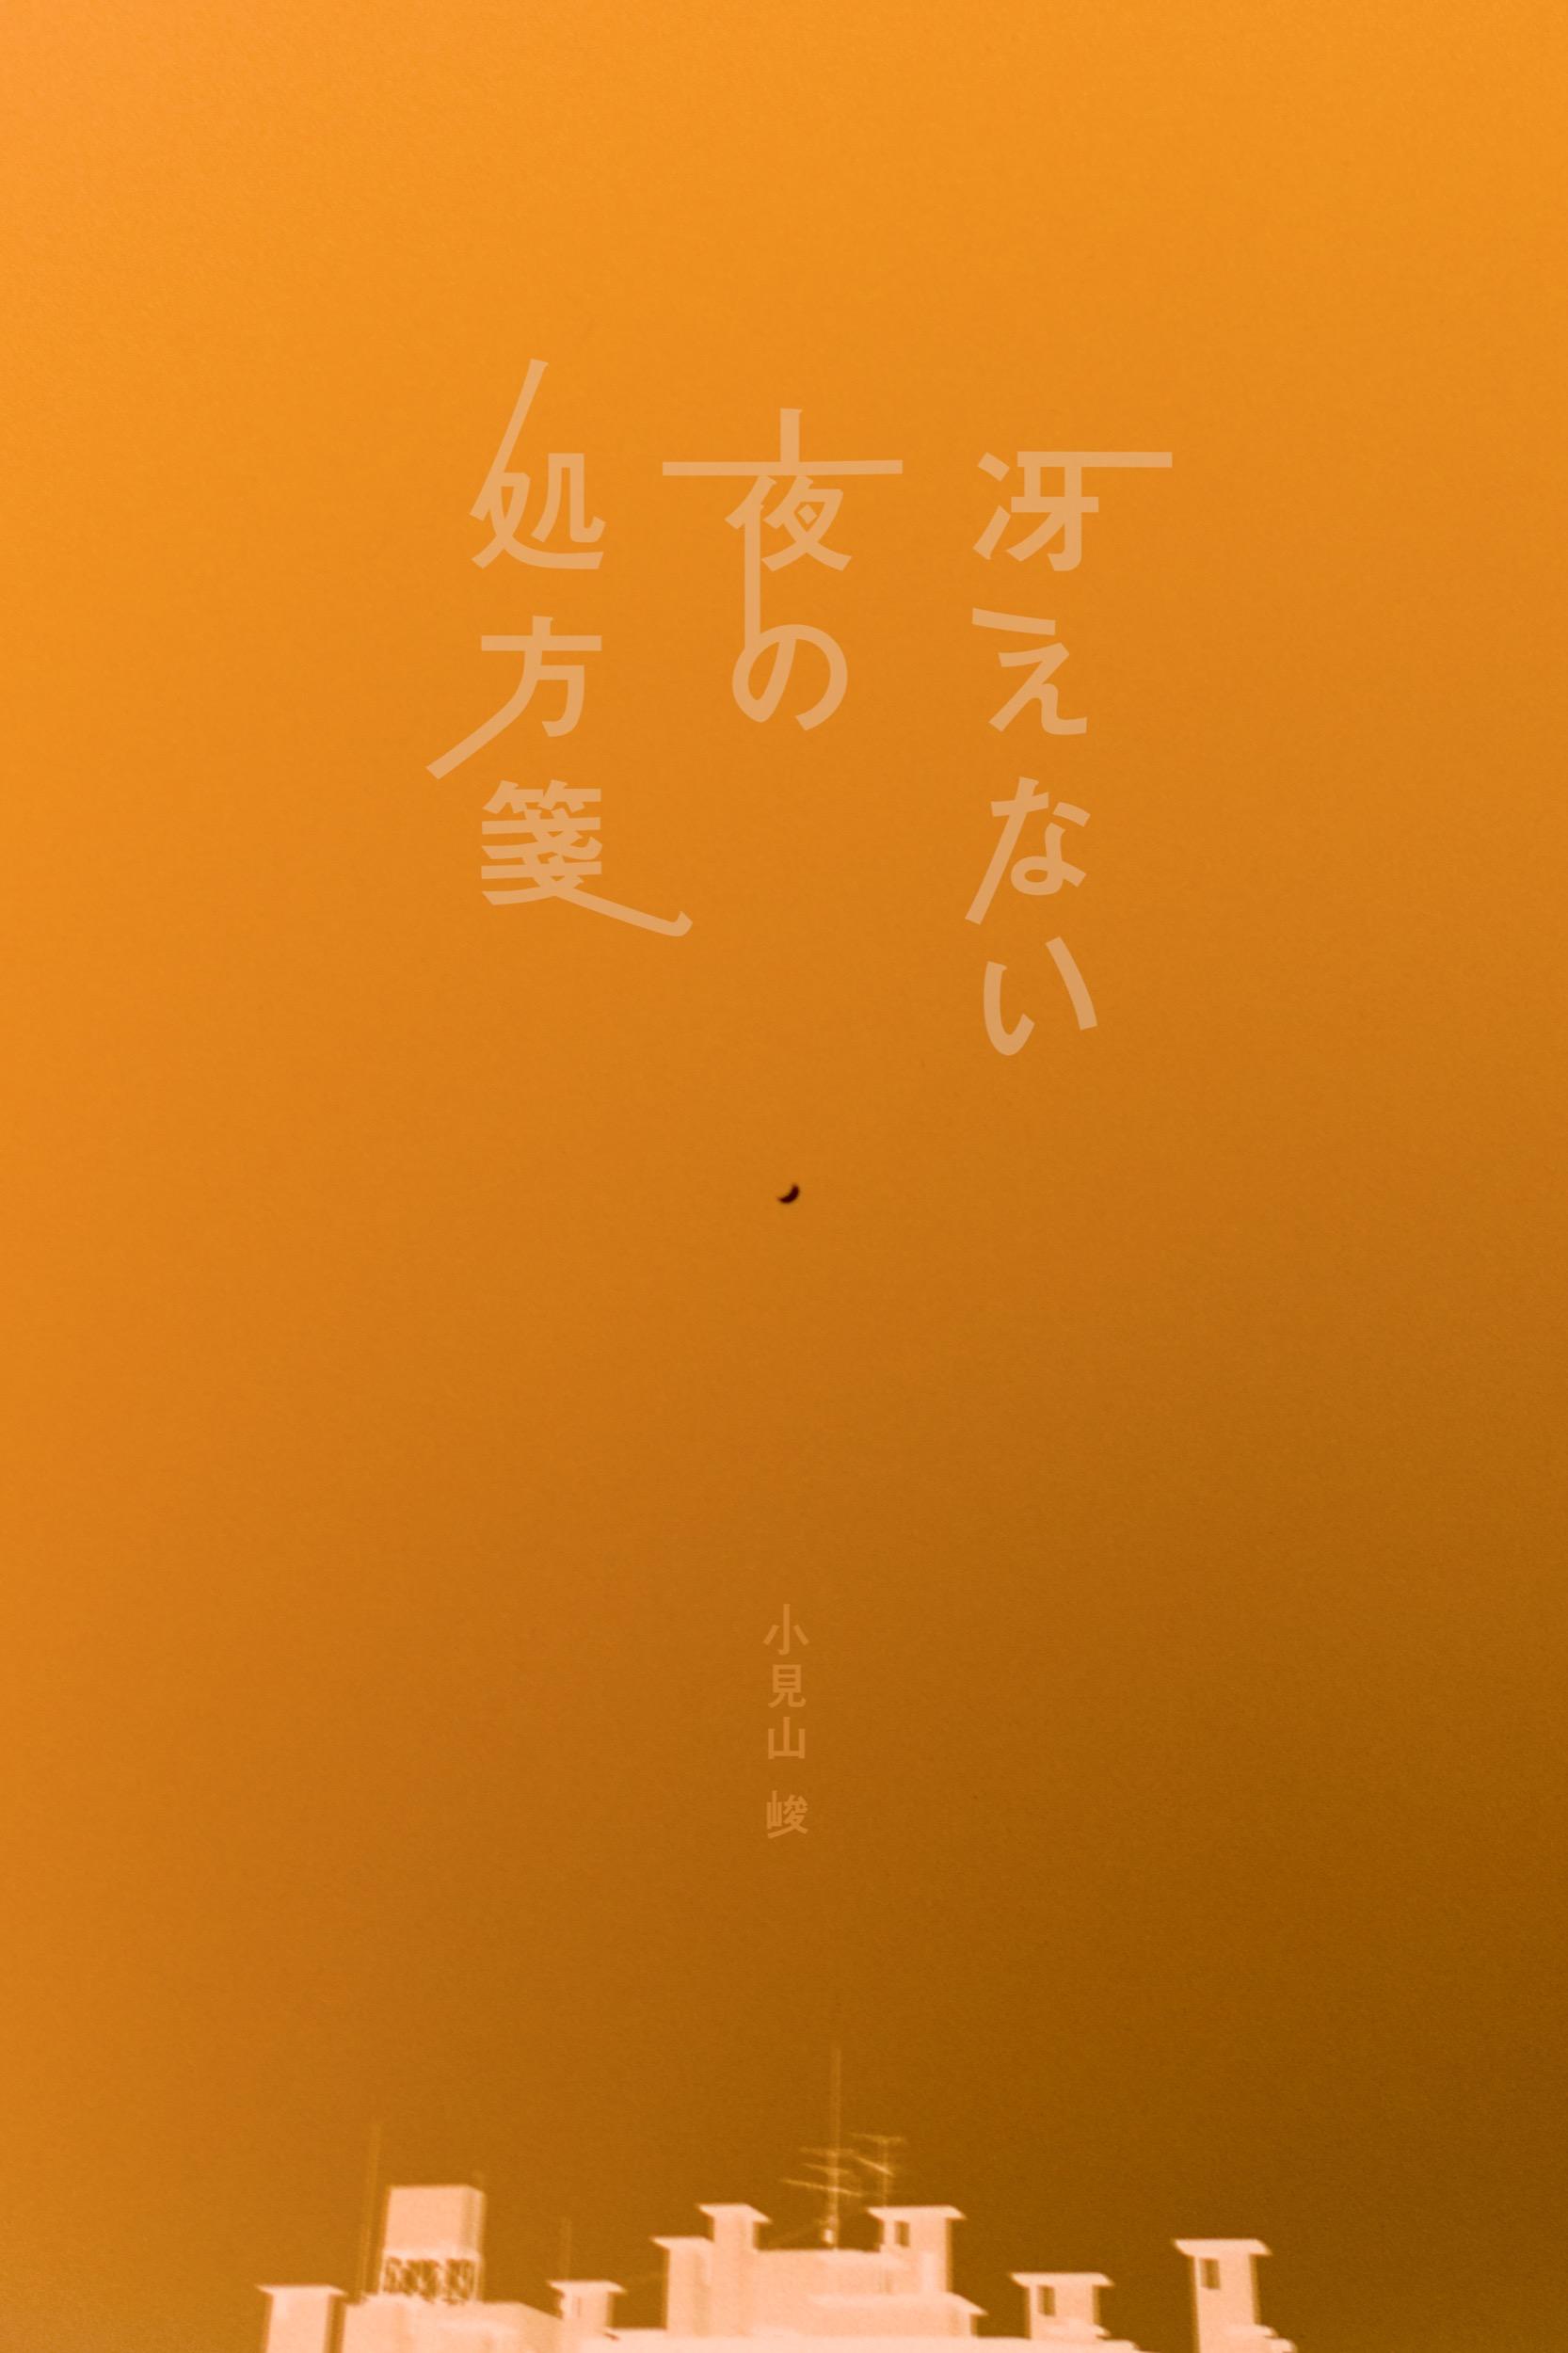 shohousen_image.jpg